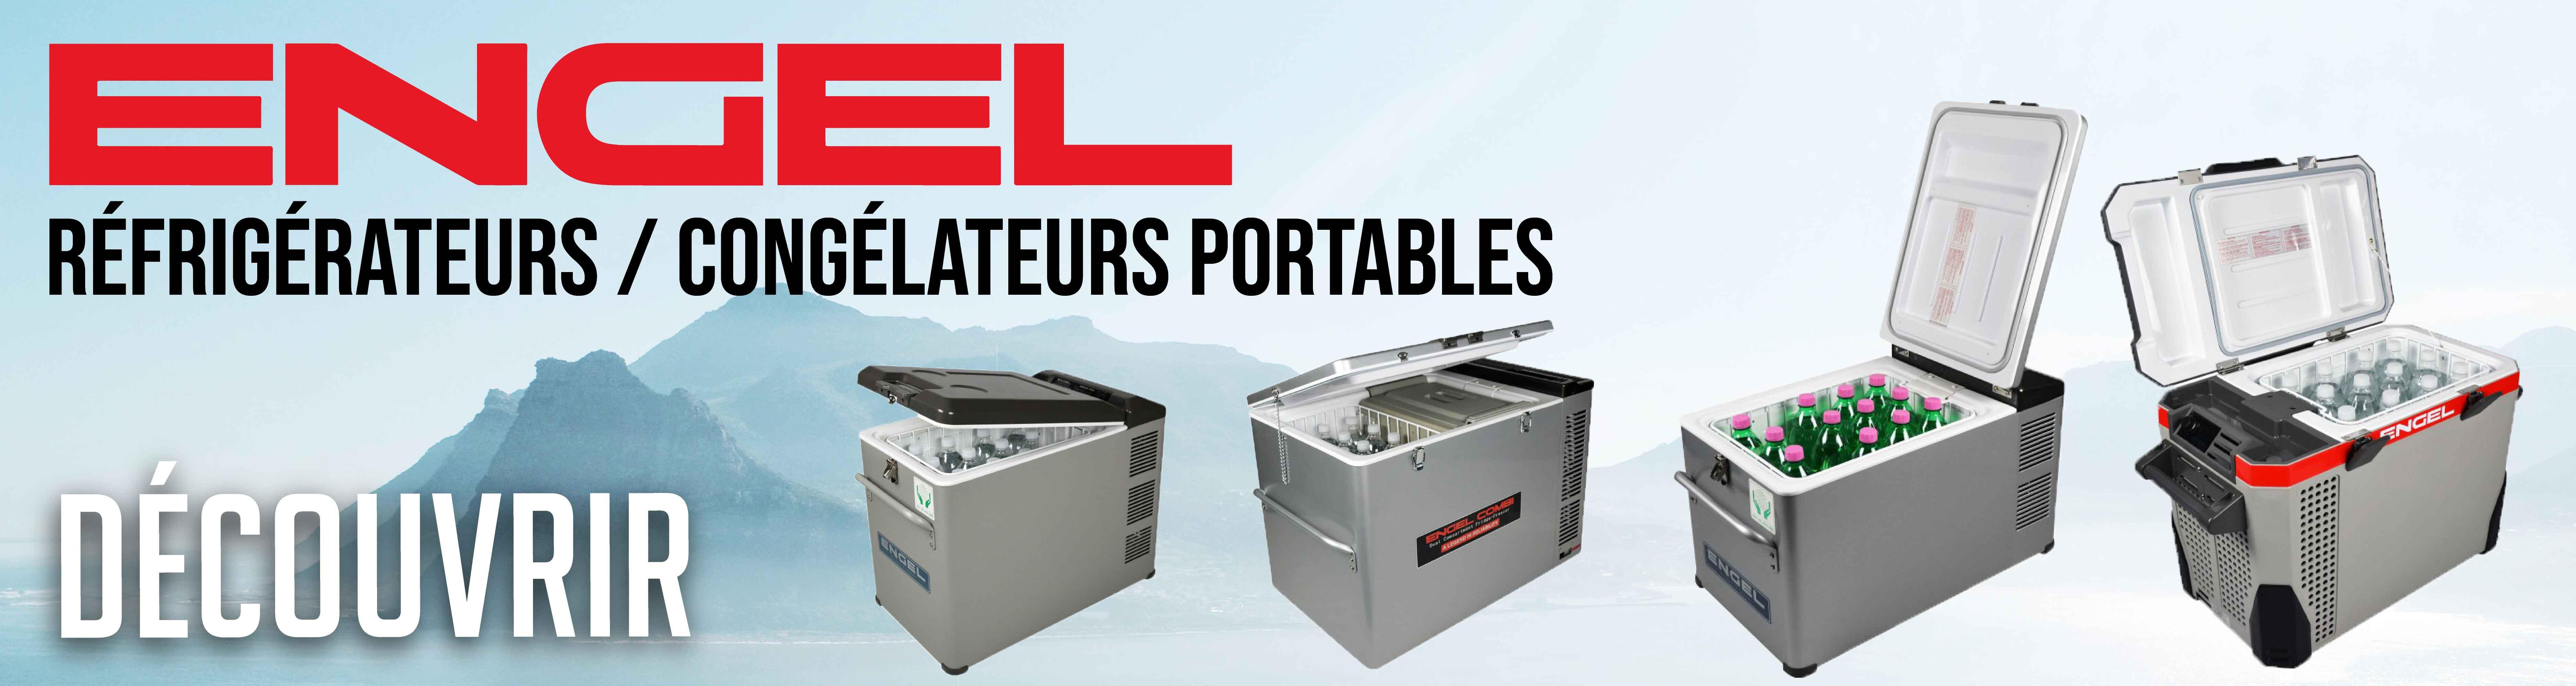 slider-2019-engel-fridge-cooler-refrigerateur-portables-congelateur